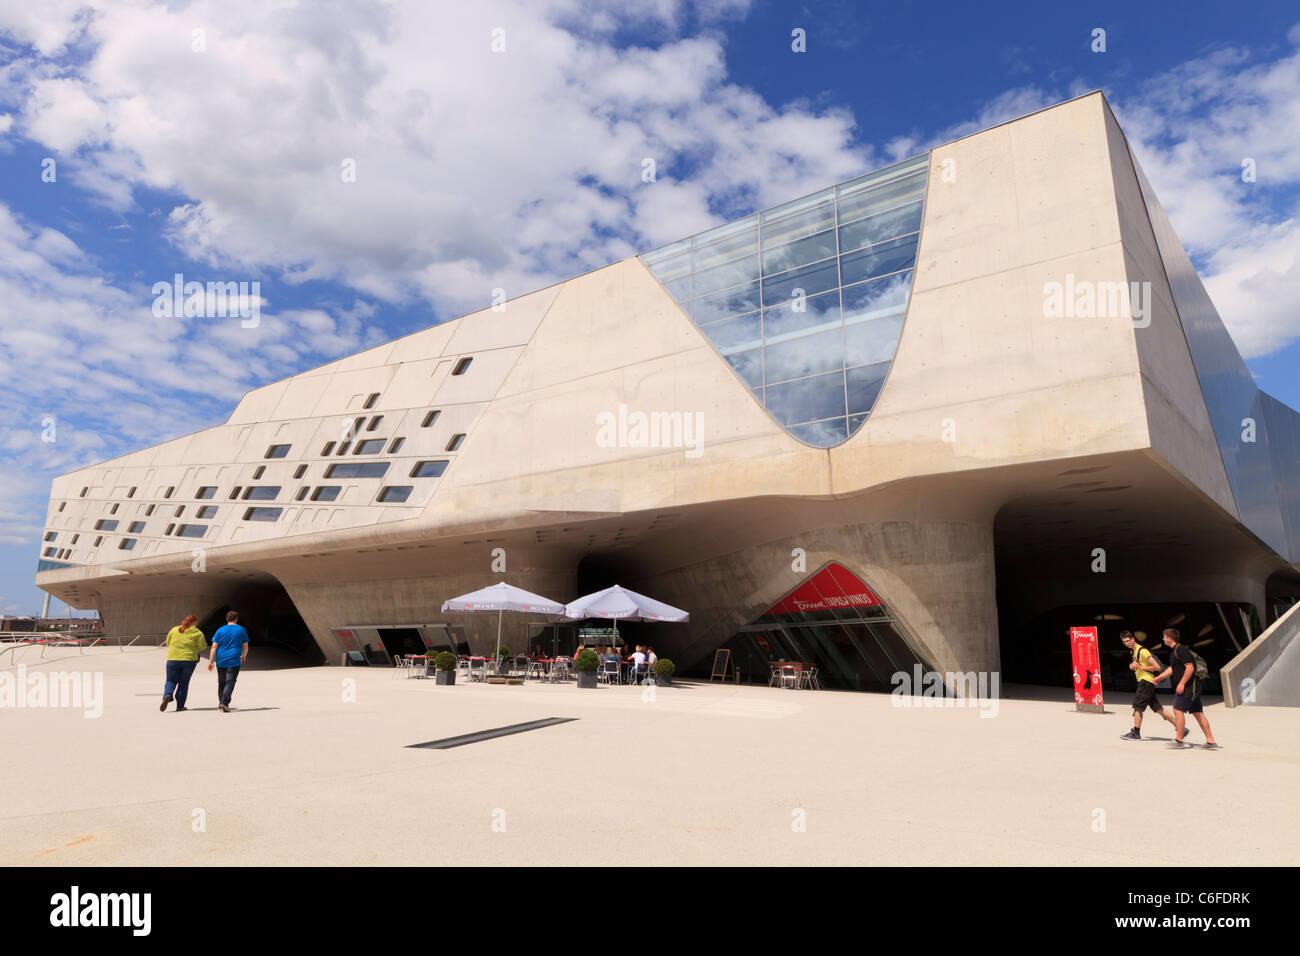 The Phaeno Science Center in Wolfsburg, Germany, designed by architect Zaha Hadid. Stock Photo